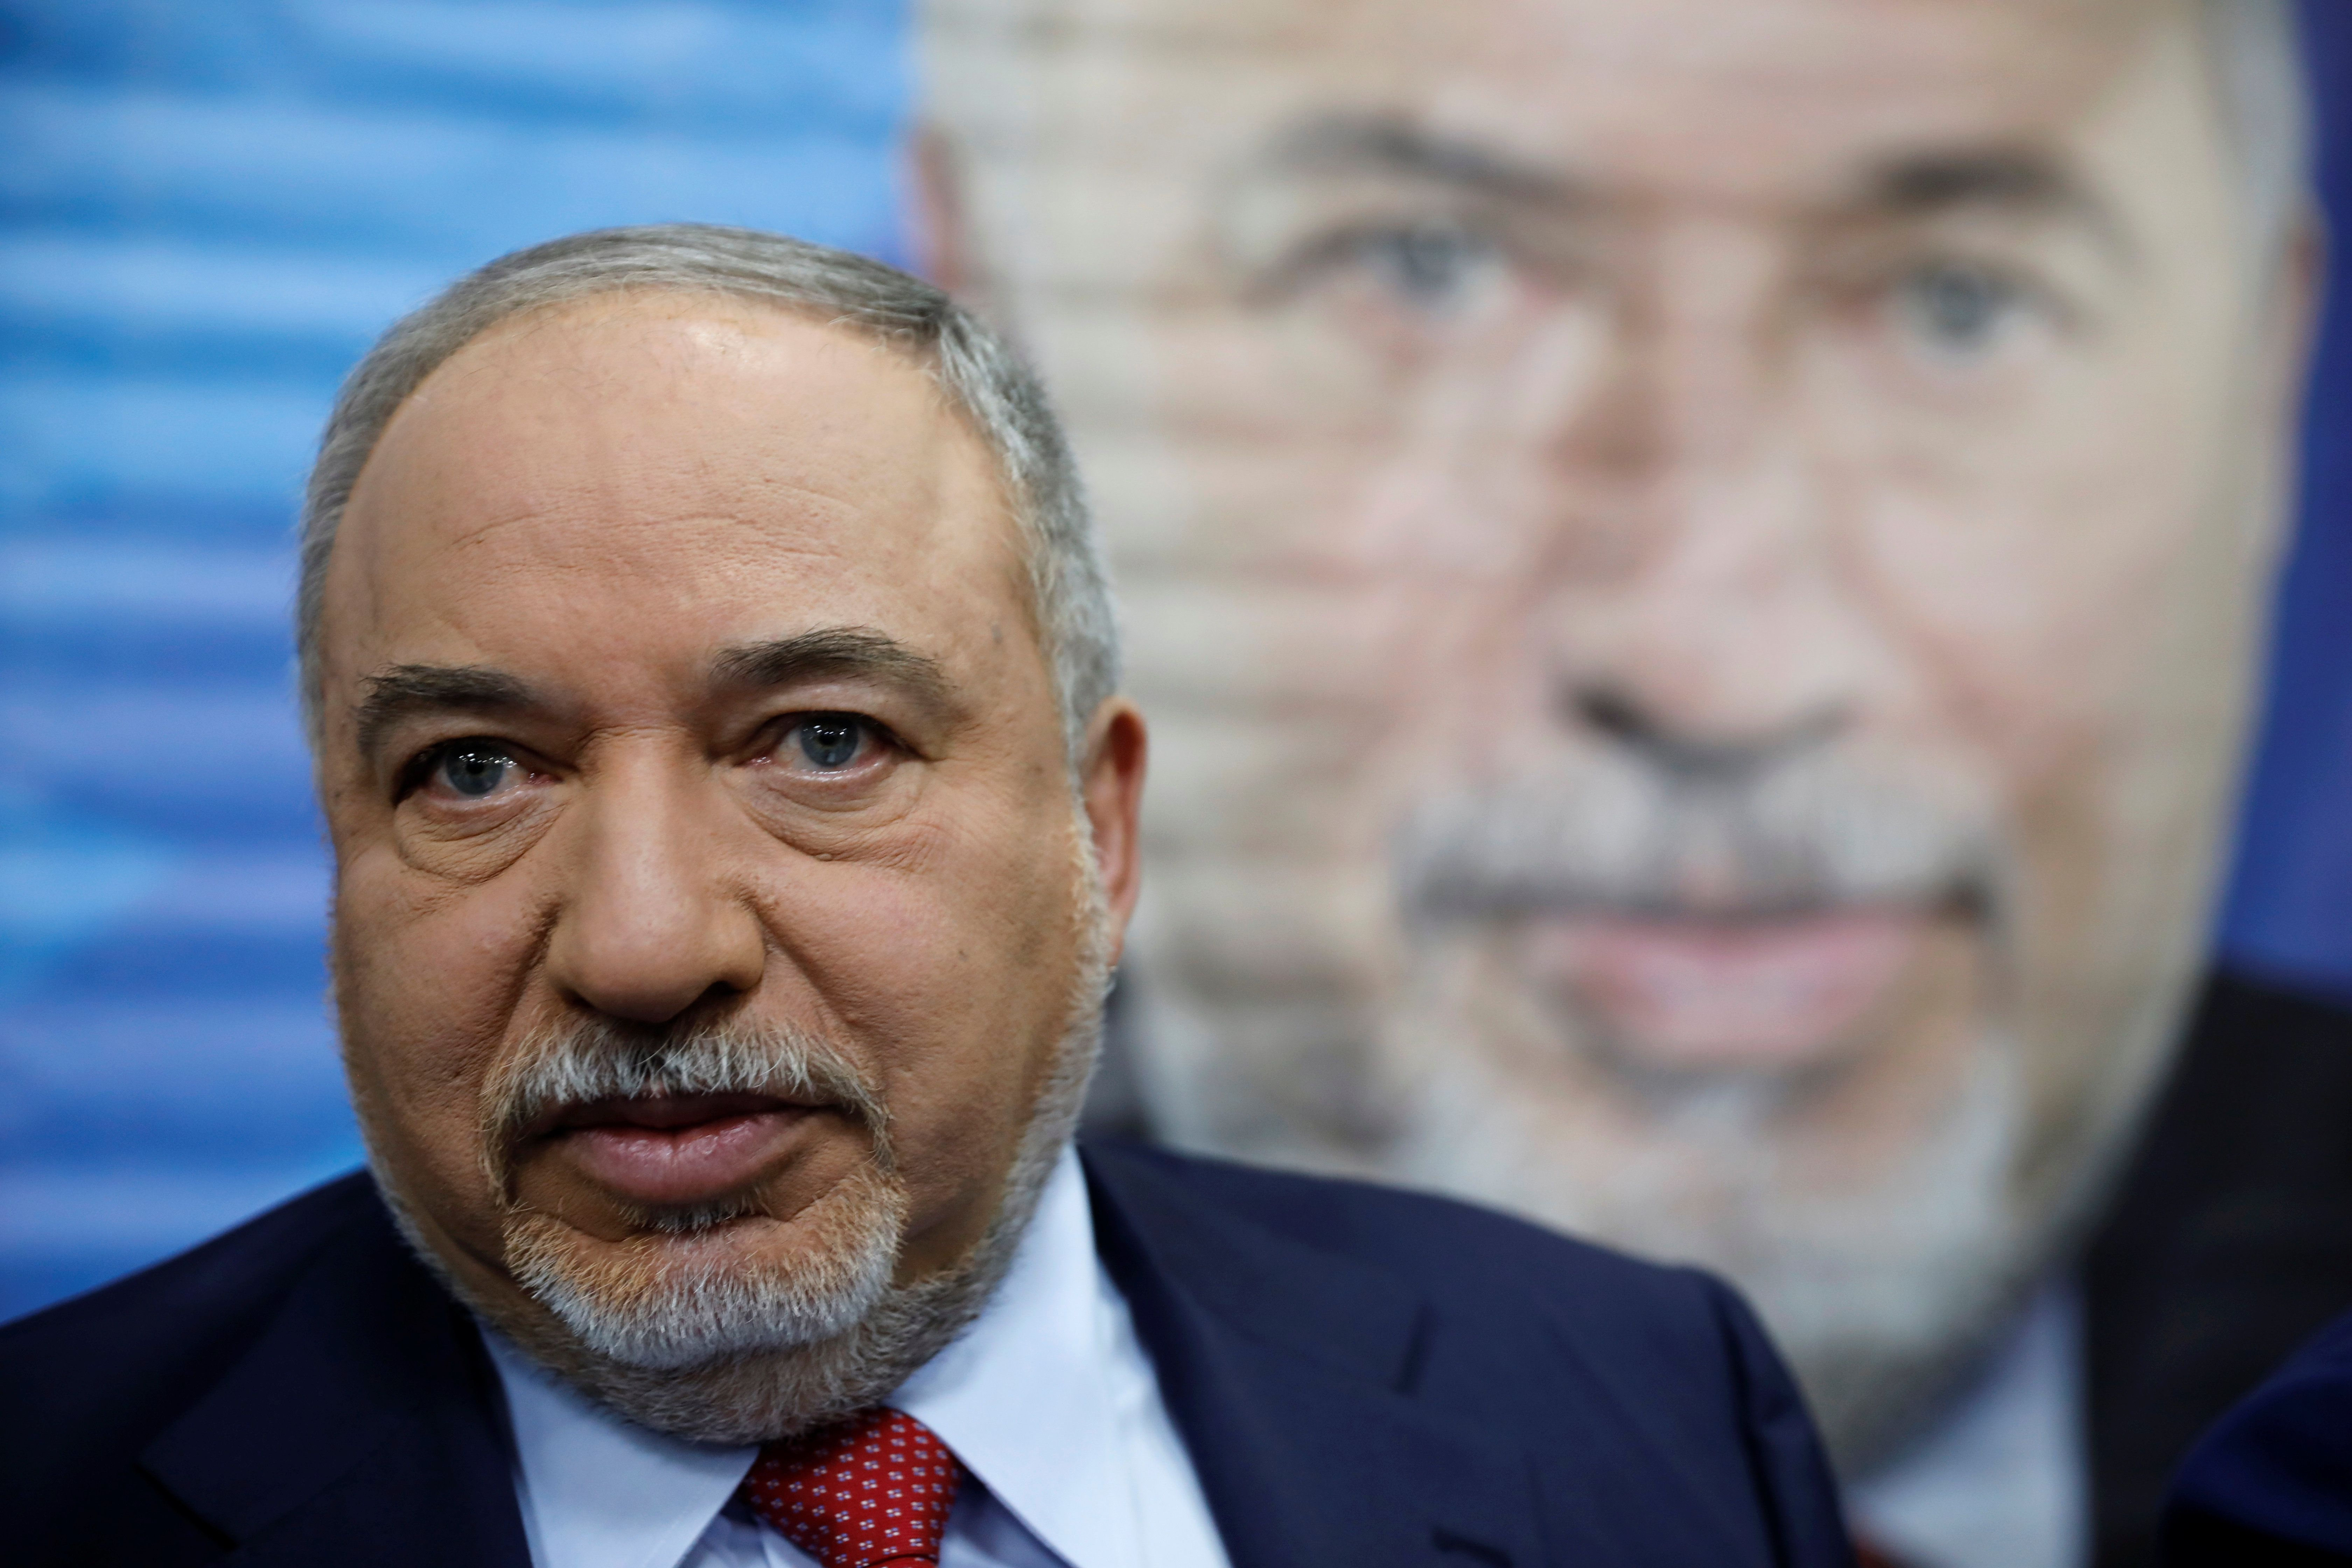 Who is Avigdor Lieberman?